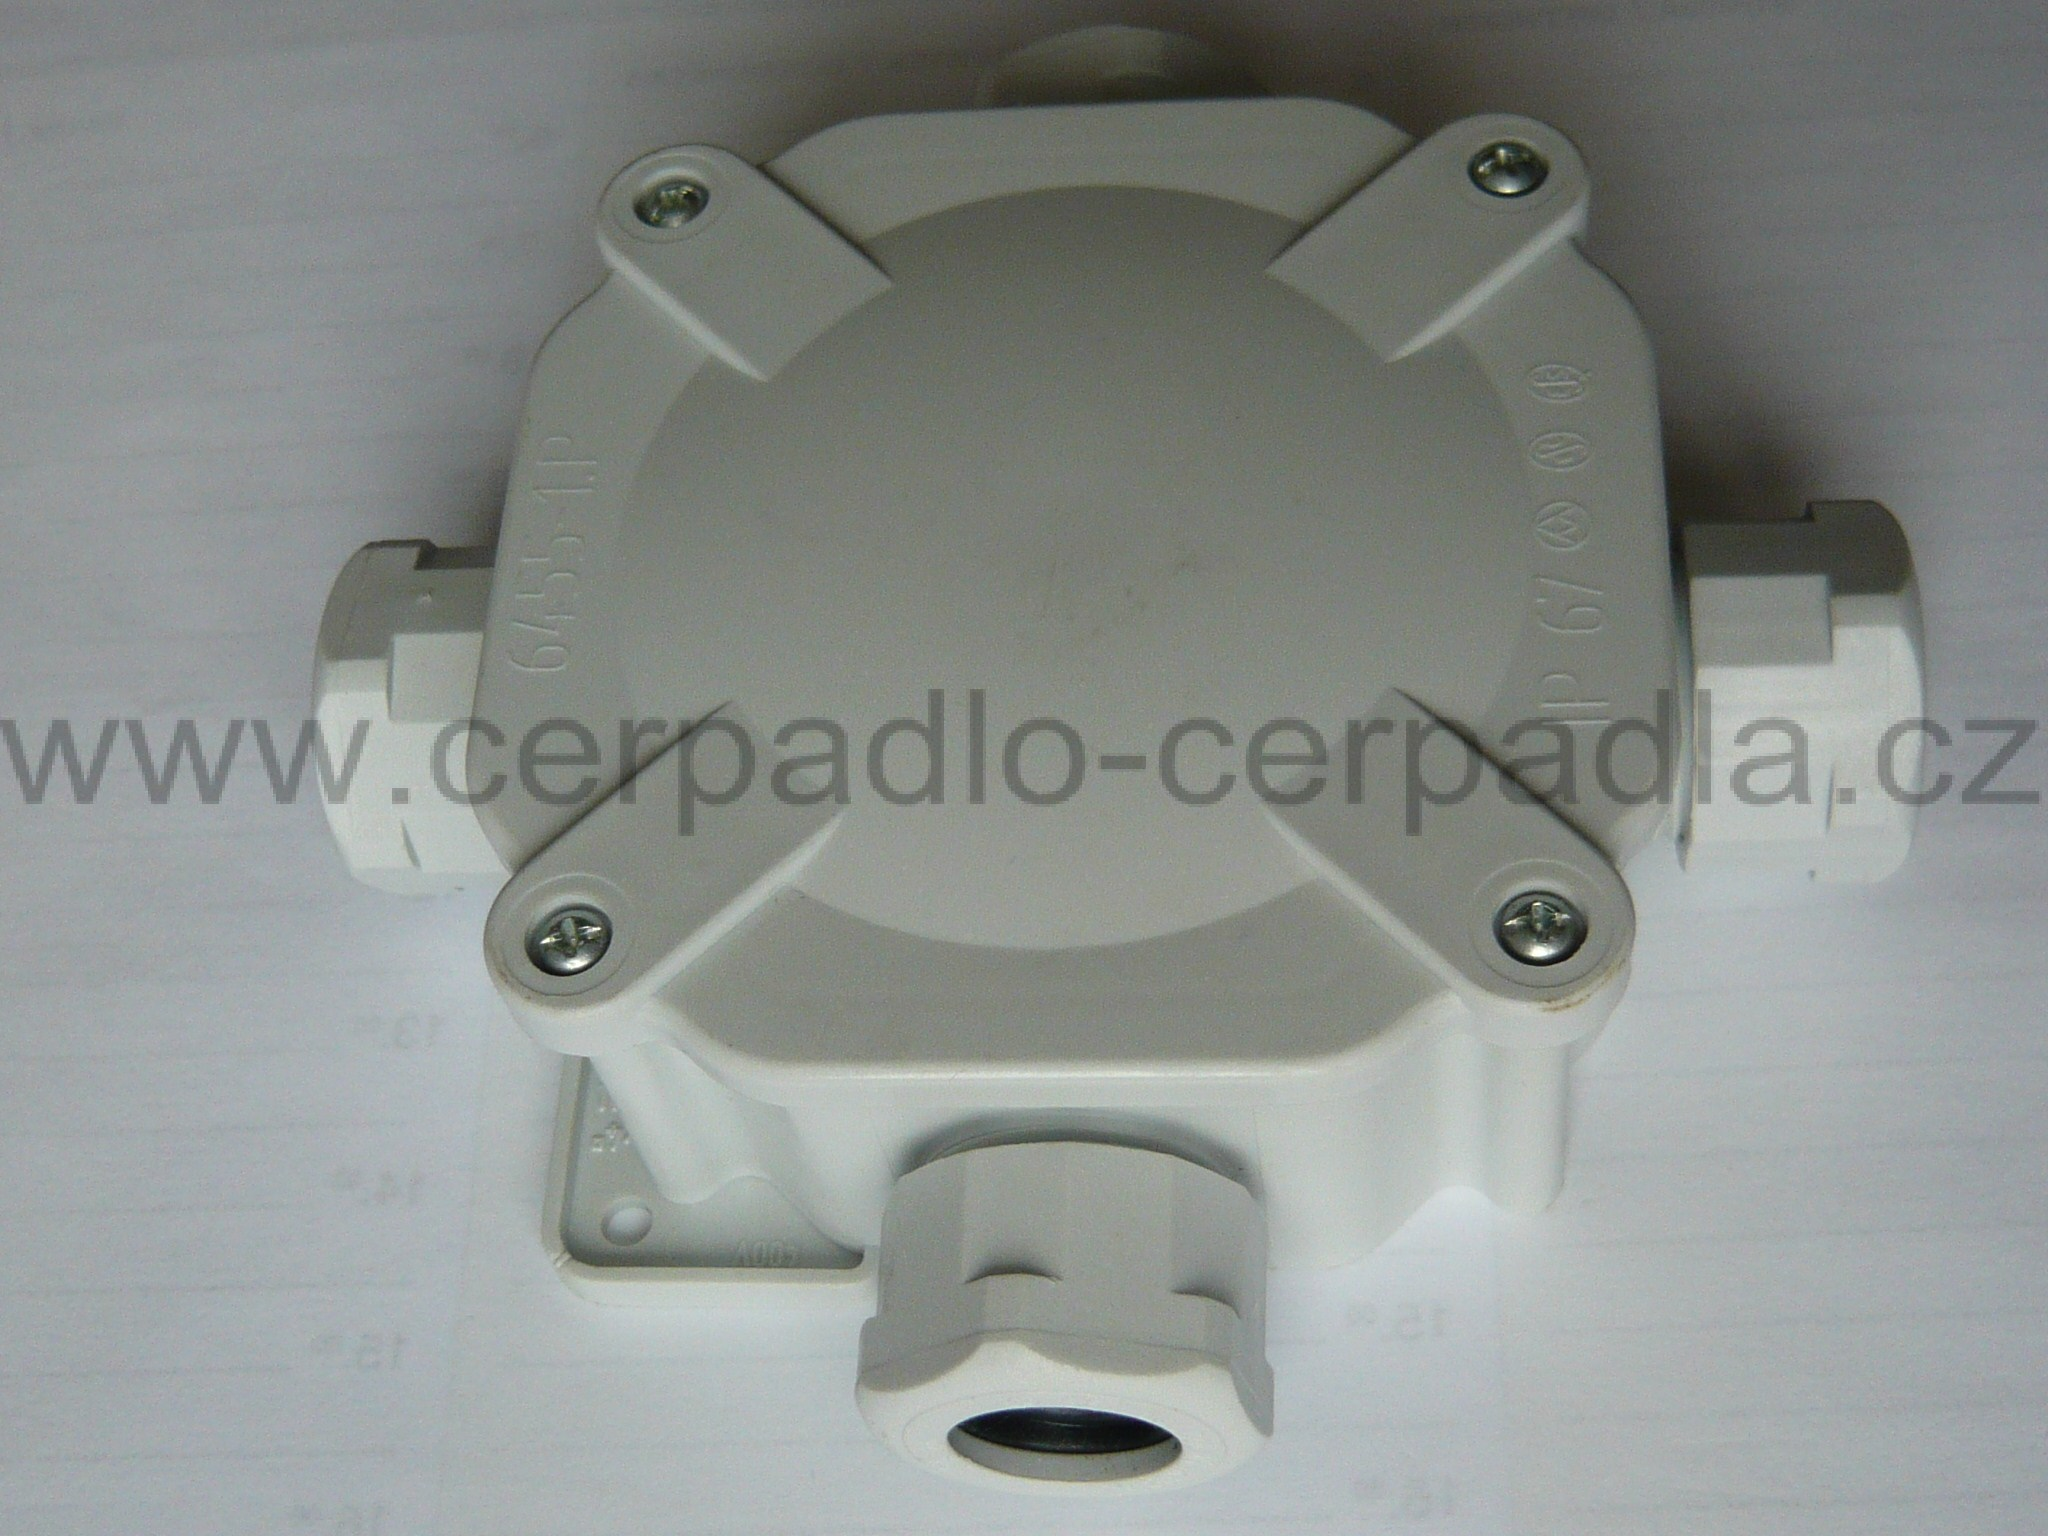 Acidurka 6455-12 , 1P , IP 67, Krabice malá Rozvodka SEZ - CZ (Rozvodka malá)